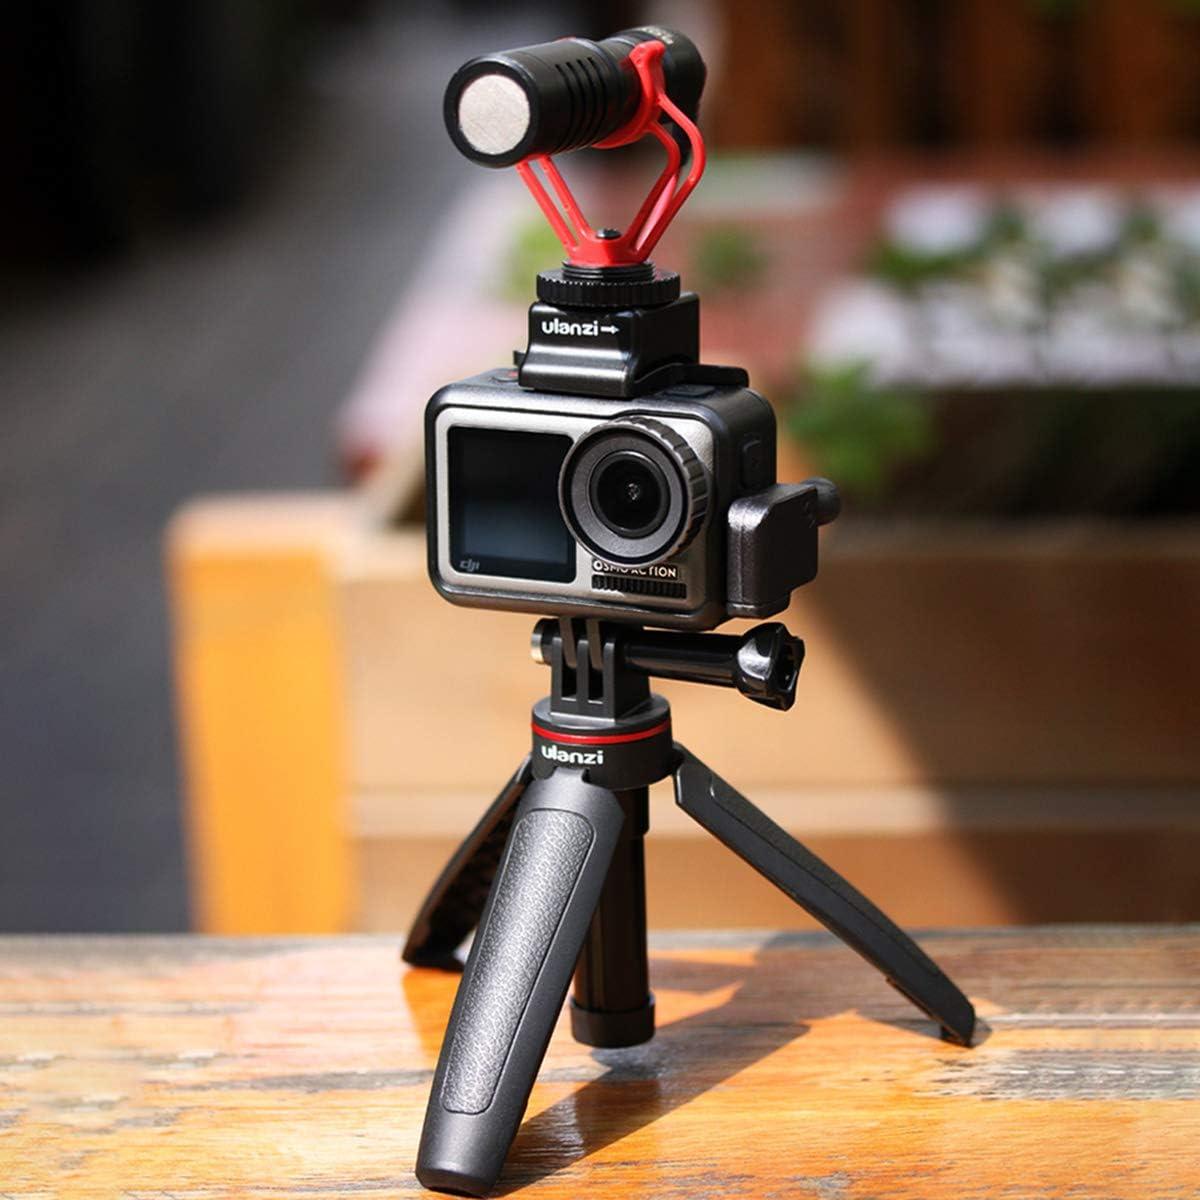 MT-09 Extendable Vlog Tripod Handle Grip Stick for GoPro Hero 8 7 6 5 4 Sport Action Cameras Vlogging Accessories